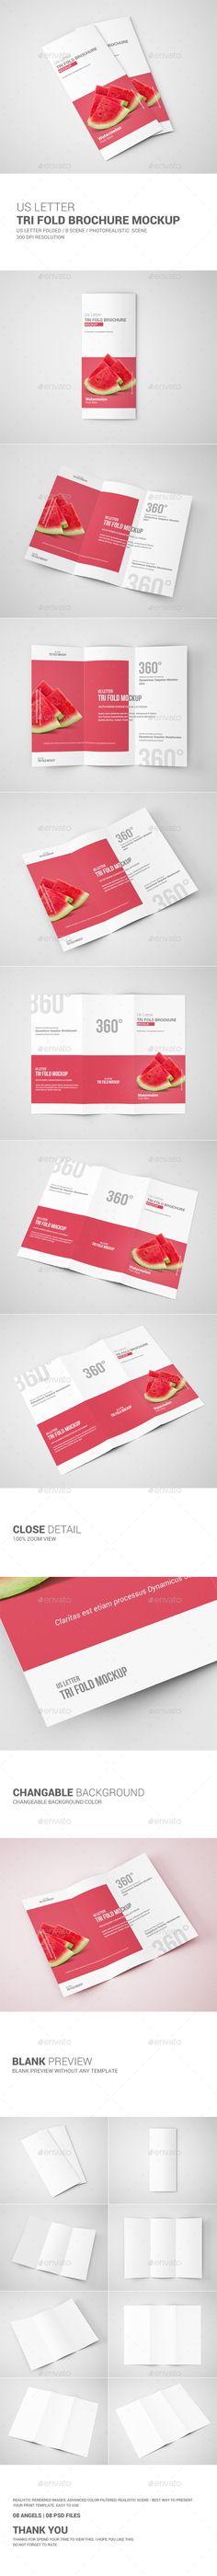 GraphicRiver Tri-Fold Brochure Mockup US Letter 10877376